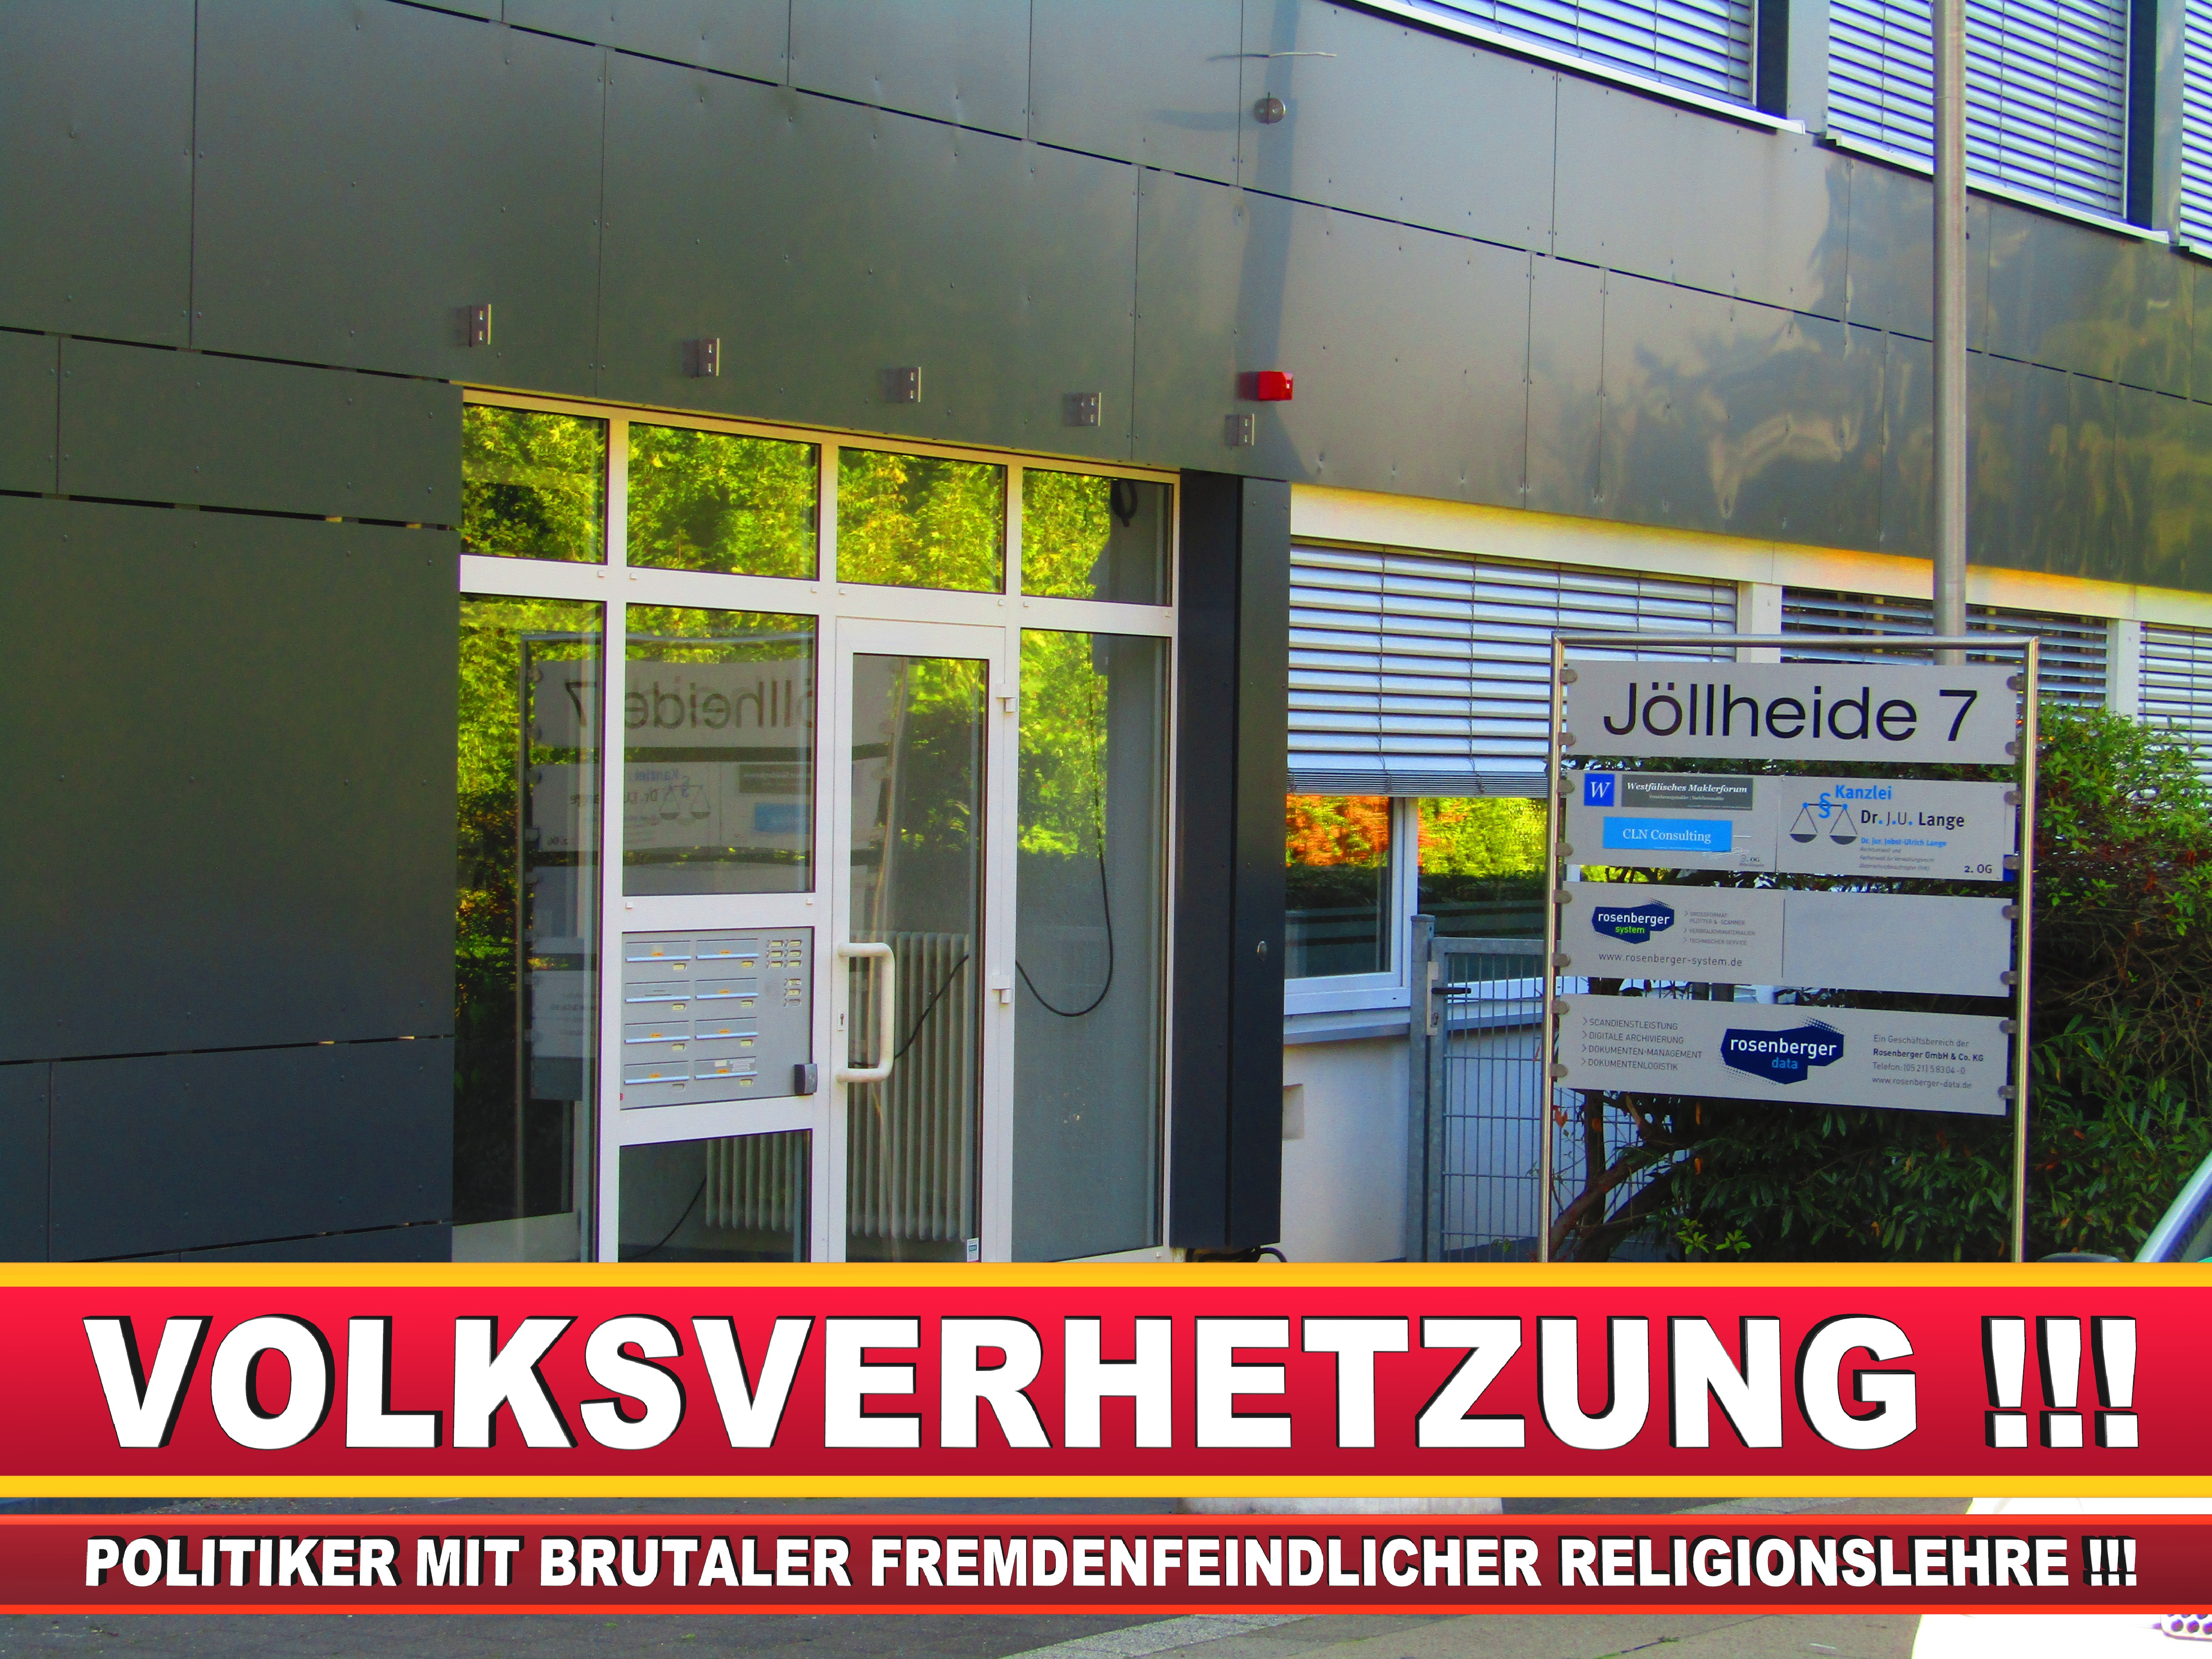 CYLL LUSCHNAT NAGEL GMBH CDU BIELEFELD BI (2) LANDTAGSWAHL BUNDESTAGSWAHL BÜRGERMEISTERWAHL